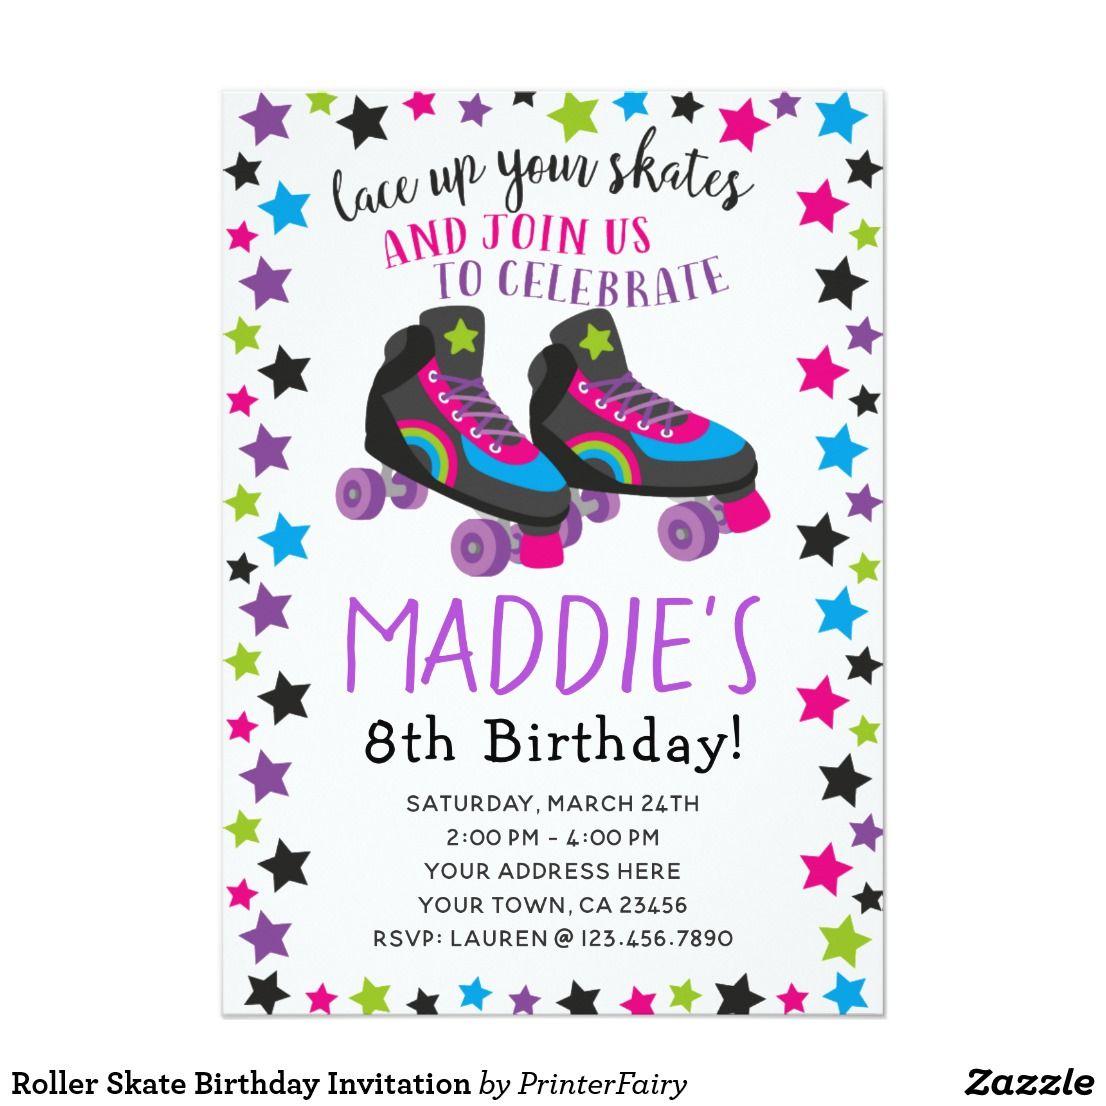 Roller Skate Birthday Invitation | Birthday ideas | Pinterest ...